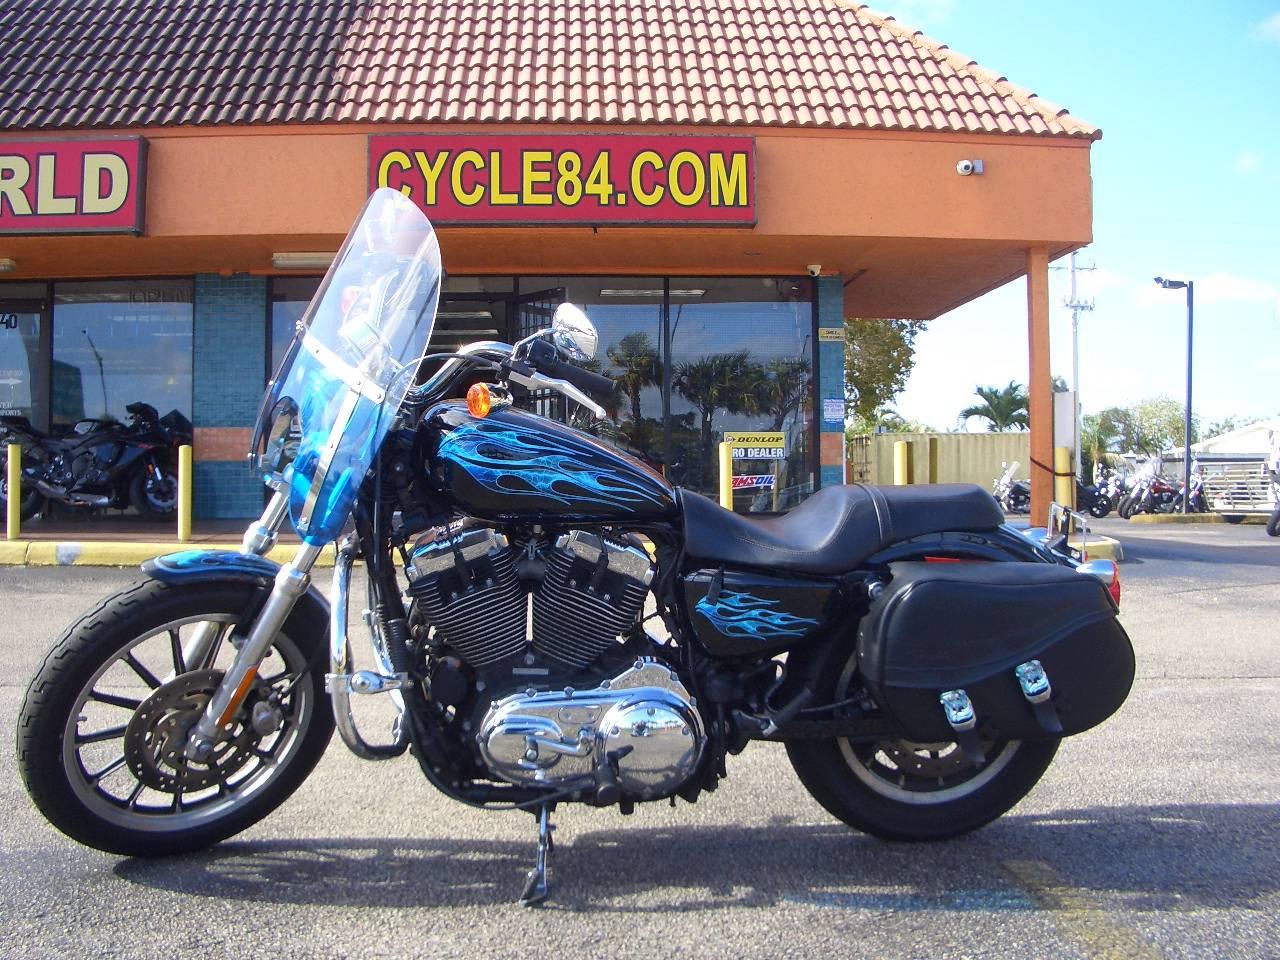 2009 Harley-Davidson Sportster 1200 Custom Vivid Black Motorcycles ...